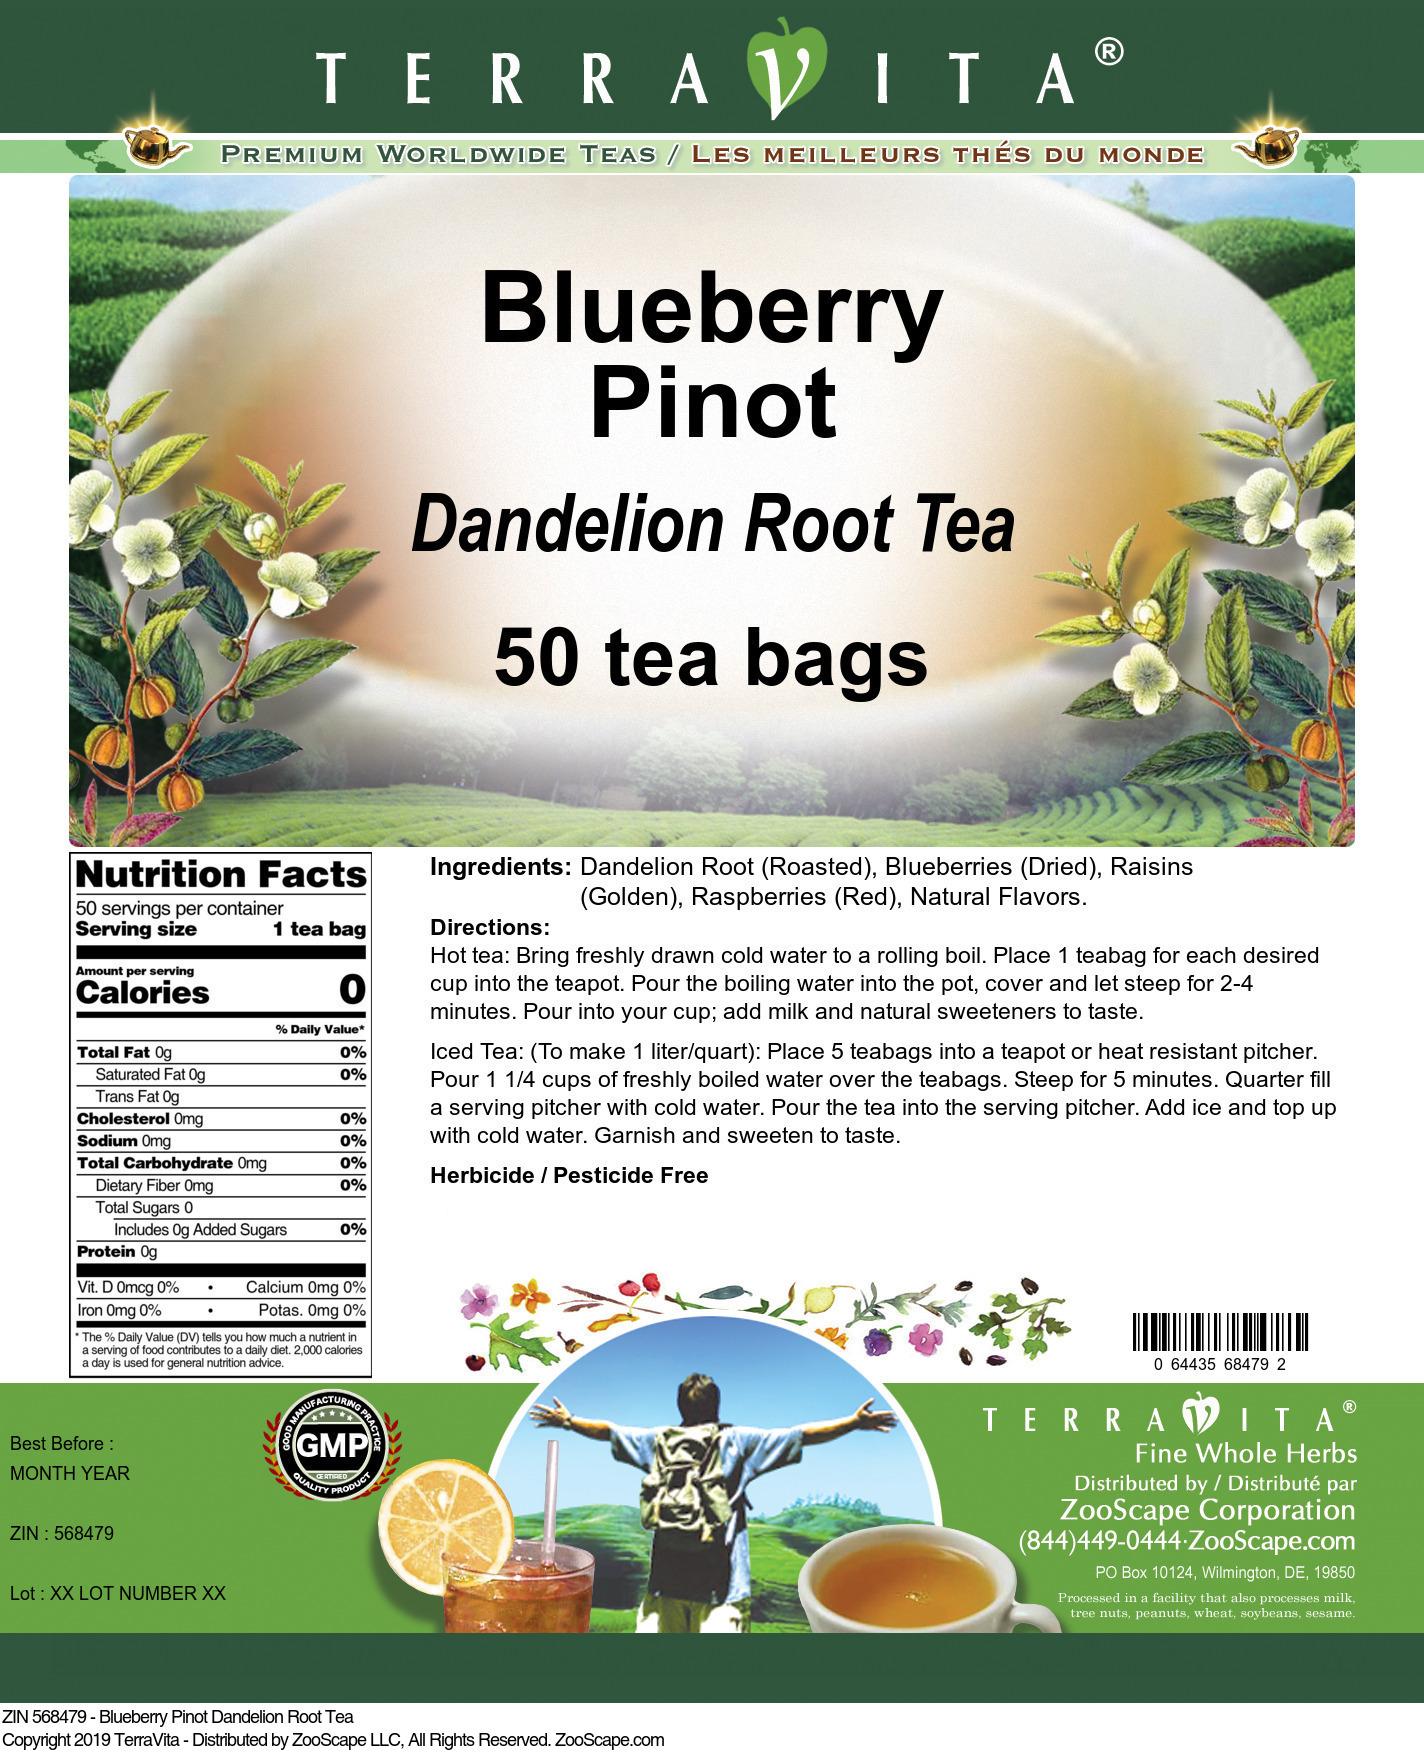 Blueberry Pinot Dandelion Root Tea